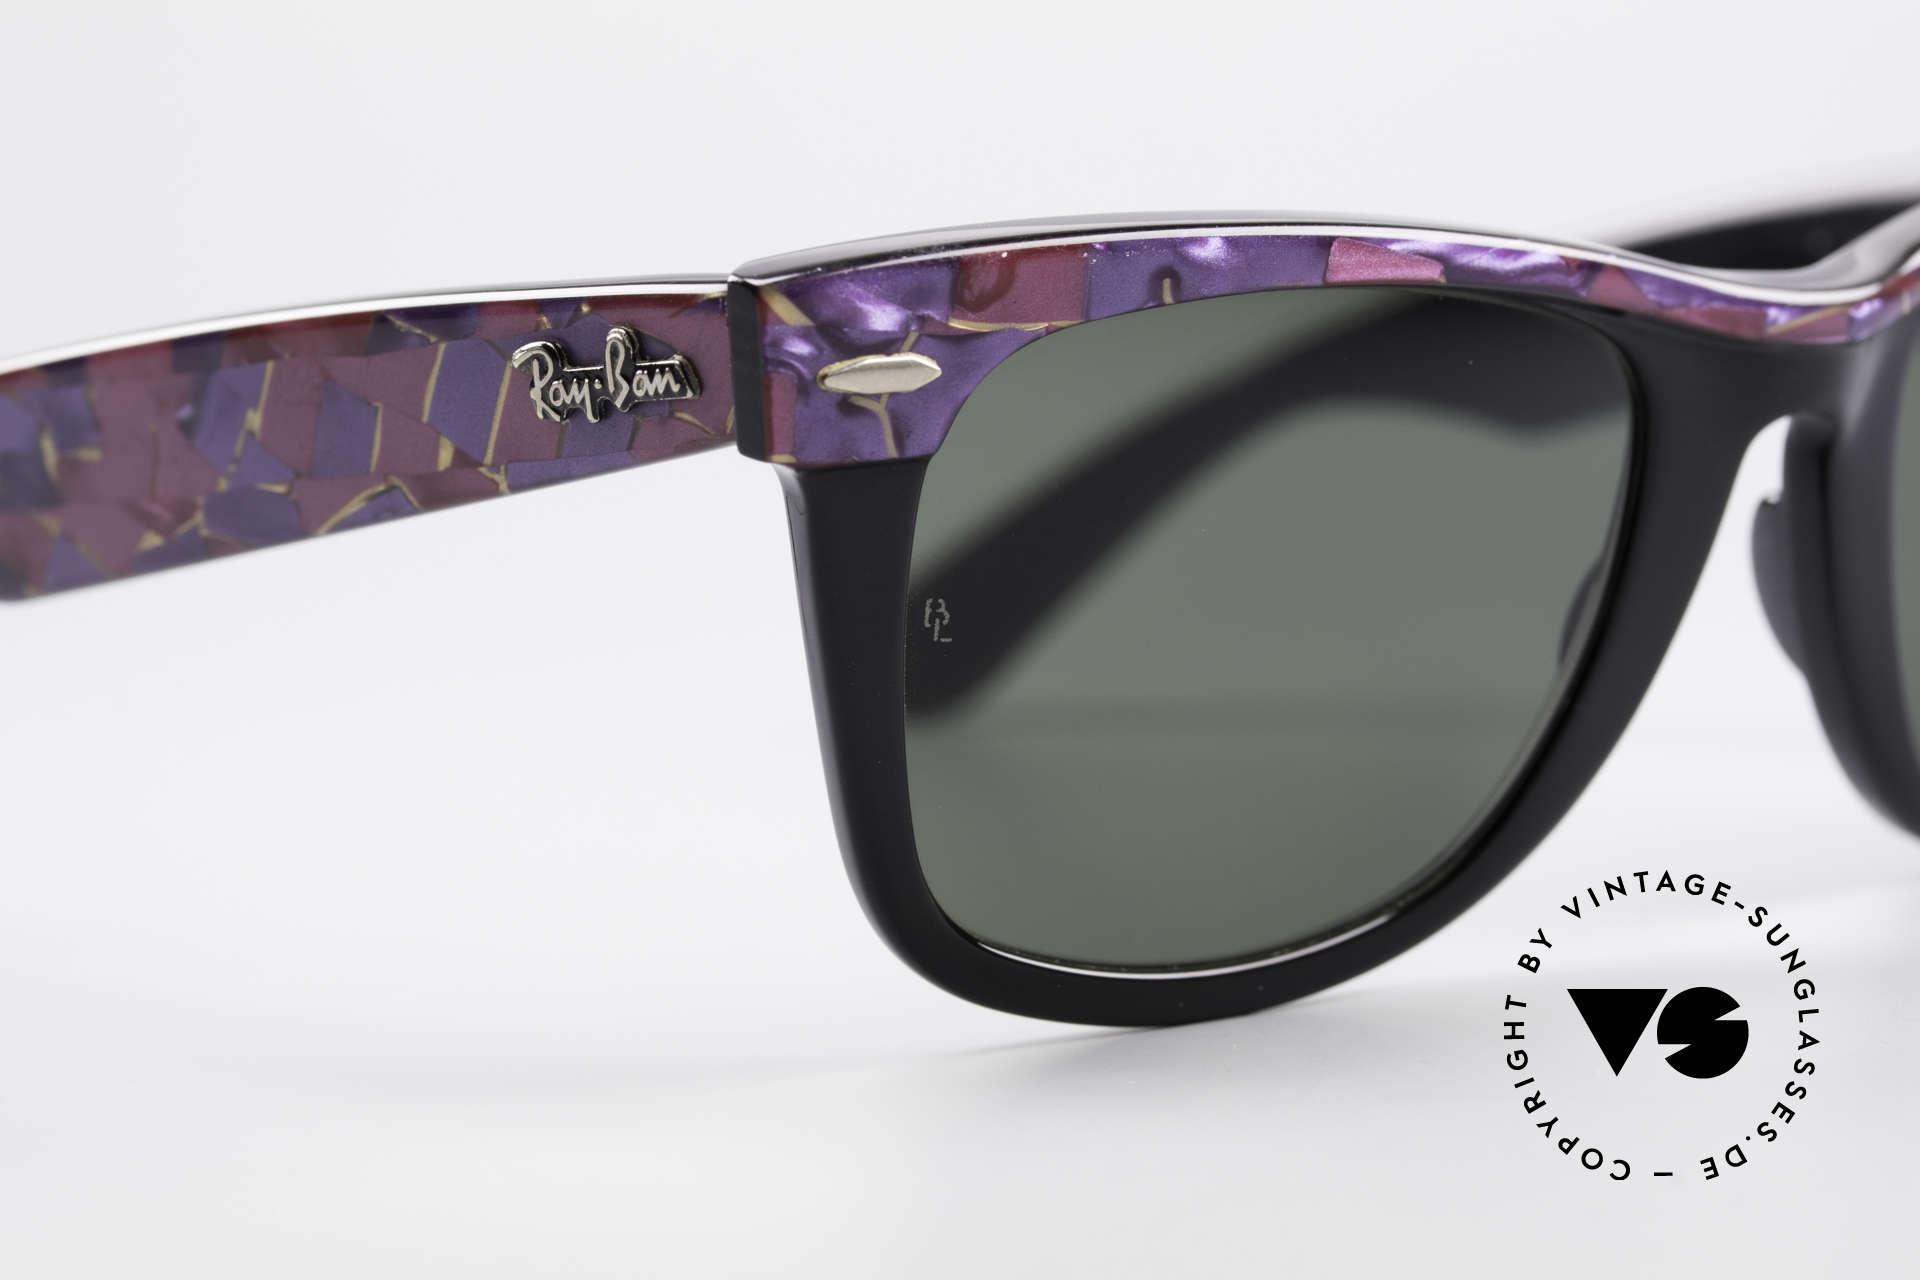 Ray Ban Wayfarer I Original Mosaic Wayfarer B&L, NO RETRO sunglasses, but an authentic old original, Made for Men and Women